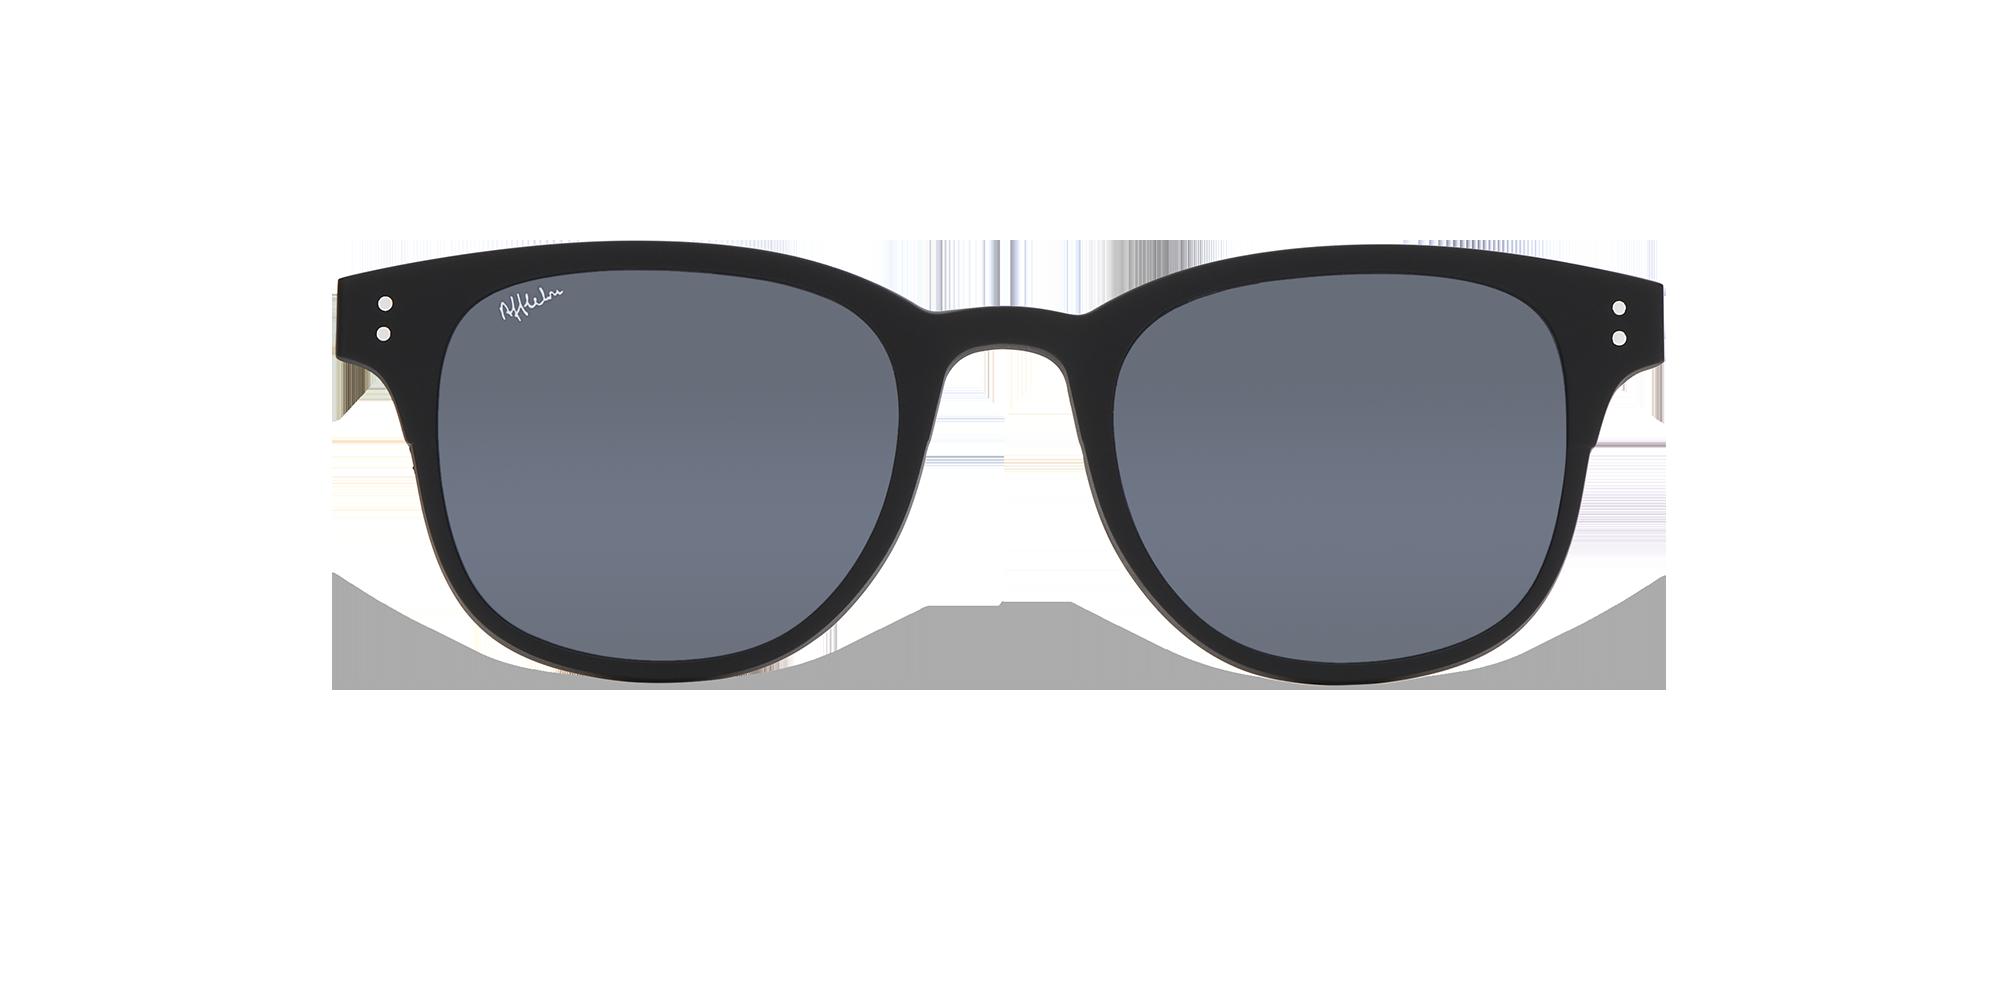 afflelou/france/products/smart_clip/clips_glasses/TMK34SUBK015021.png